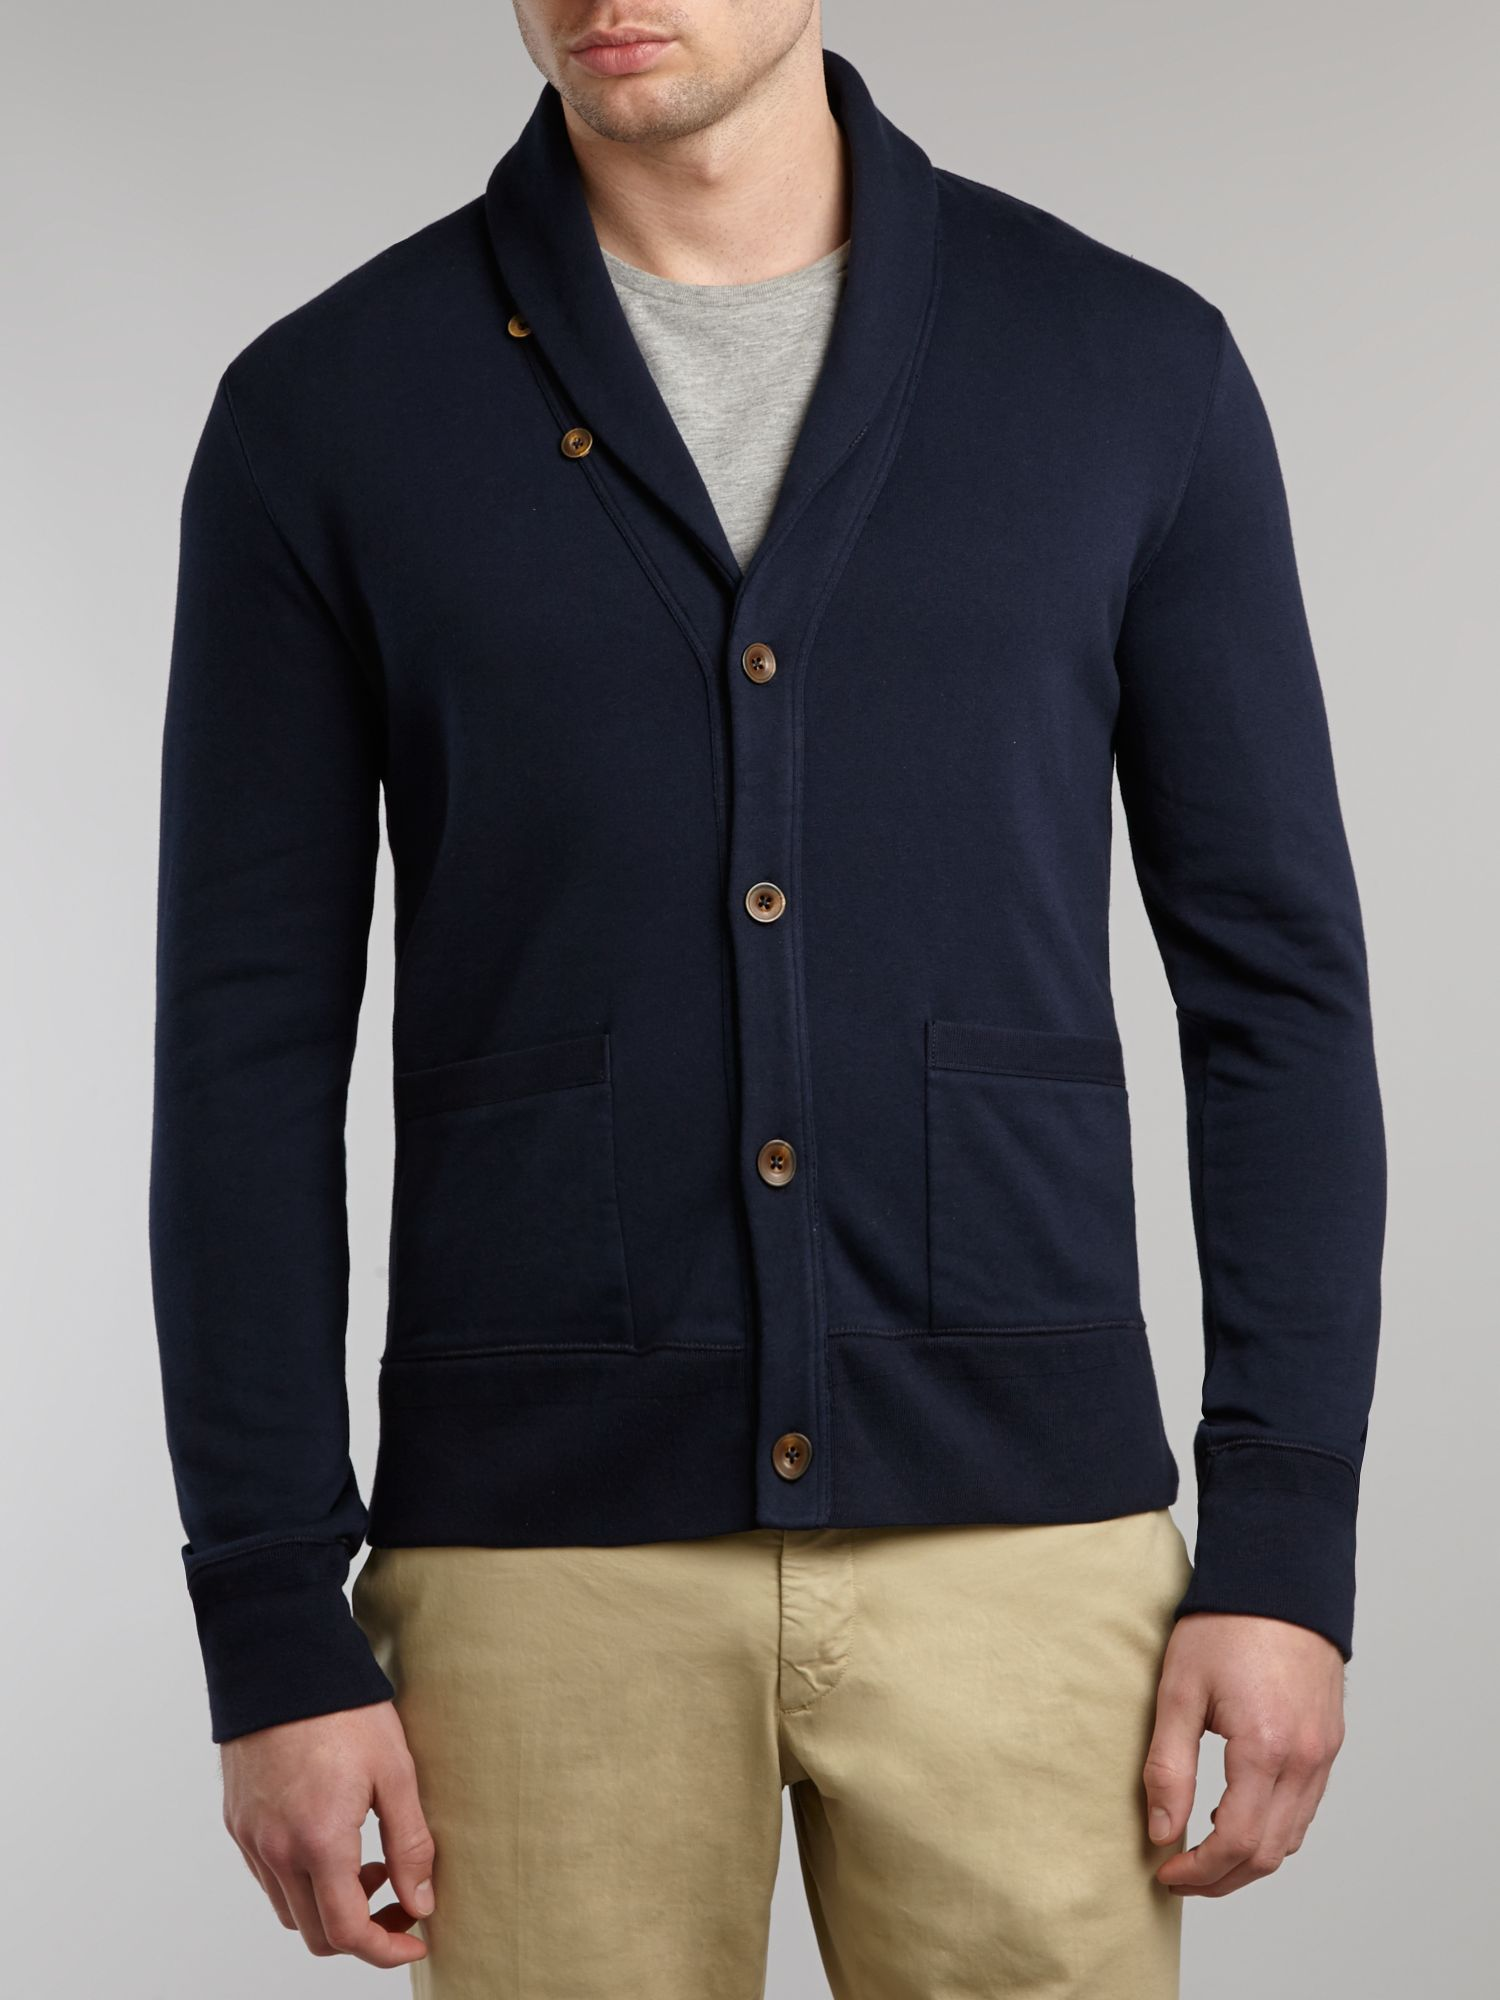 Polo Cardigan Ralph Lauren Navy Blue - English Sweater Vest